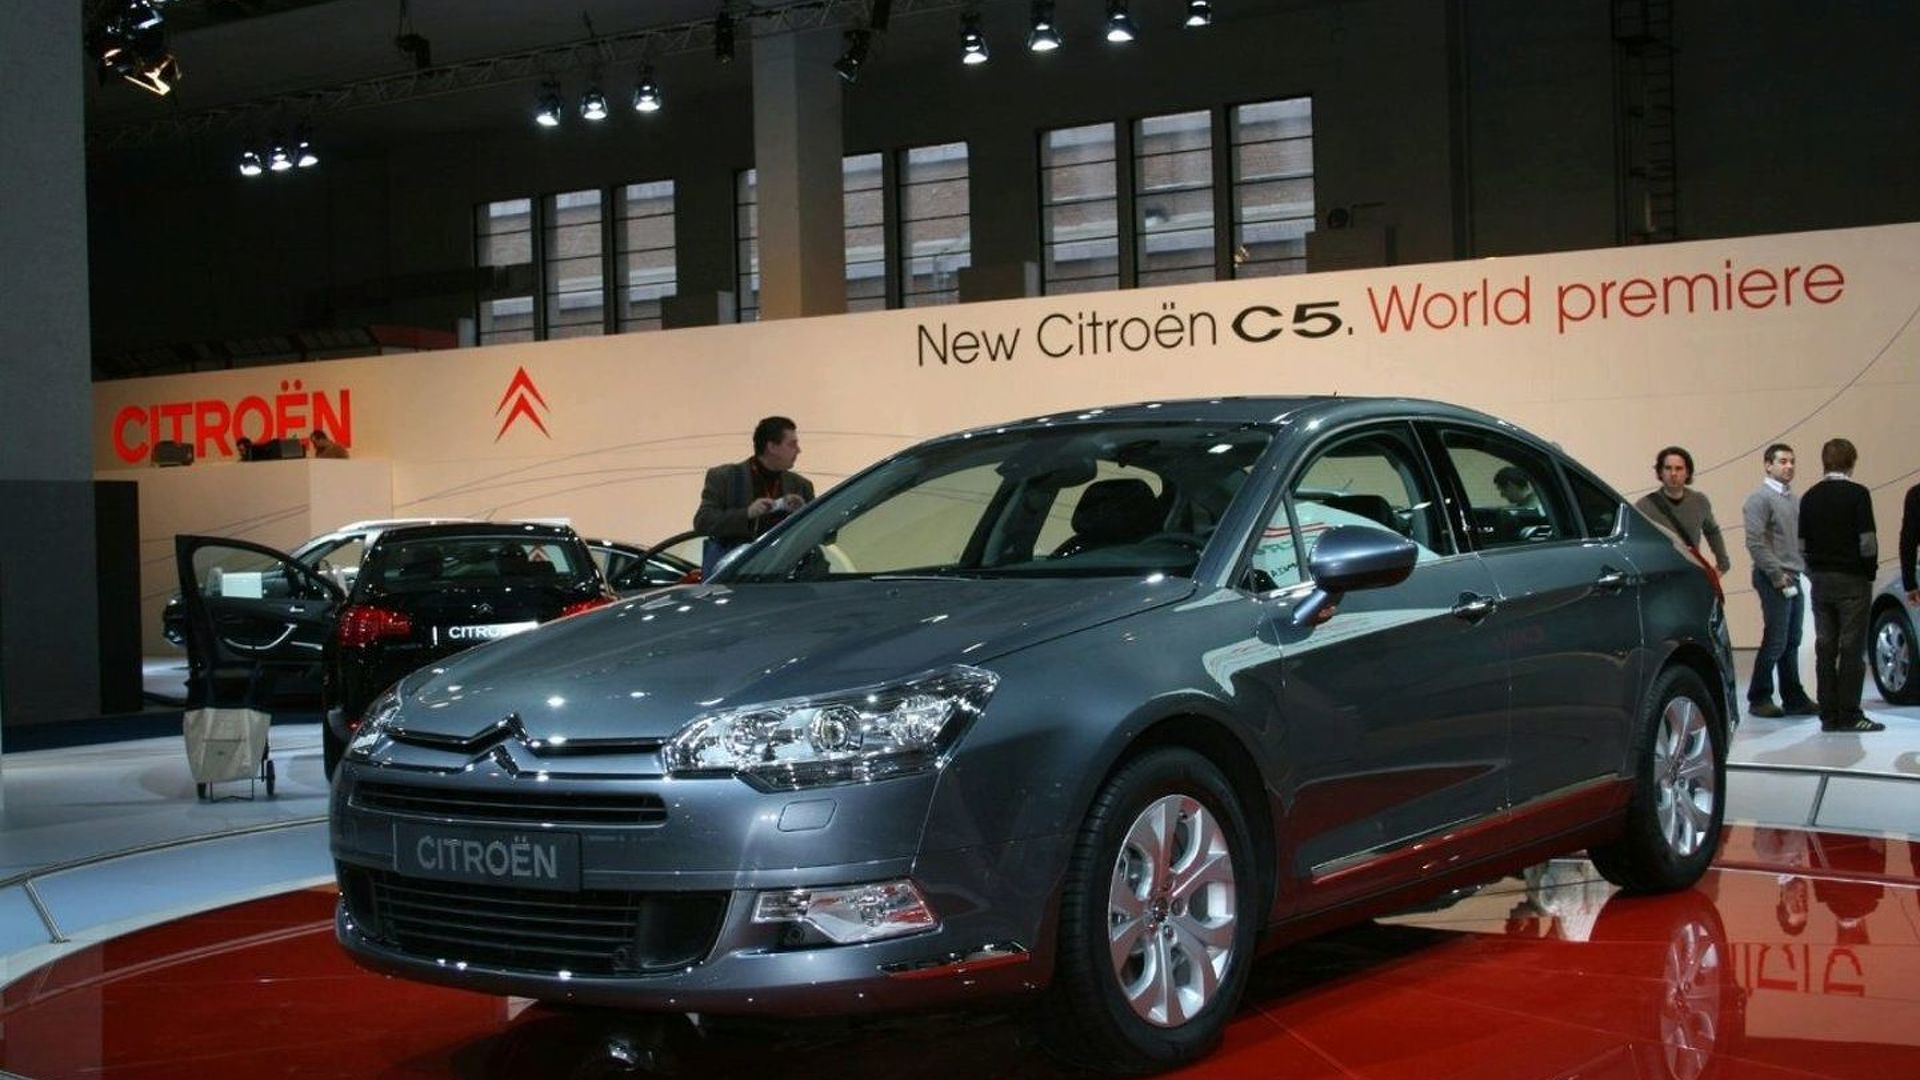 Citroen C5 Public Debut at Brussels